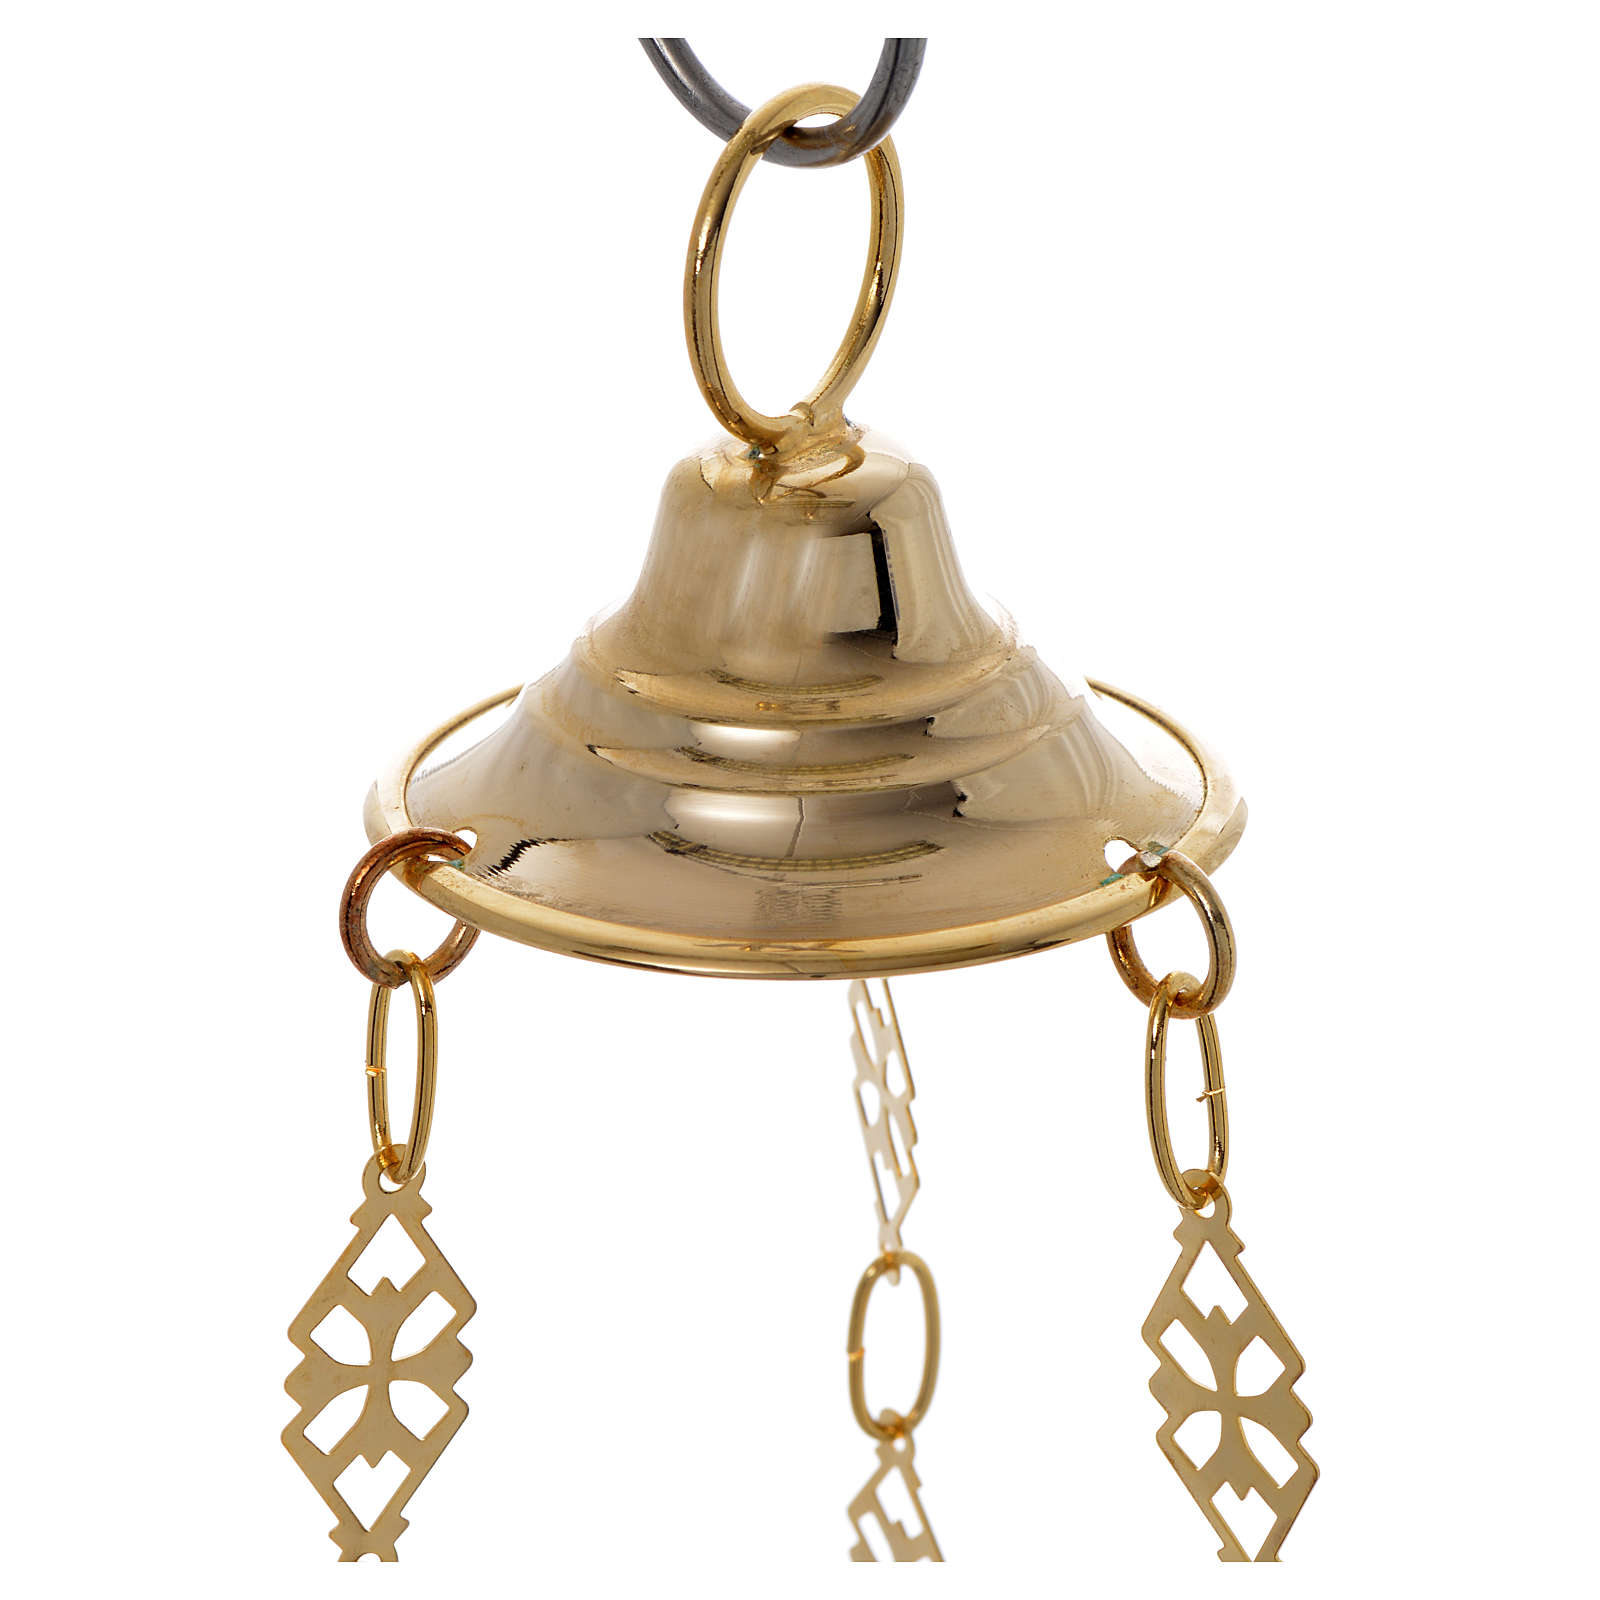 Lamparina para o Santíssimo ortodoxa 19x9 cm 3